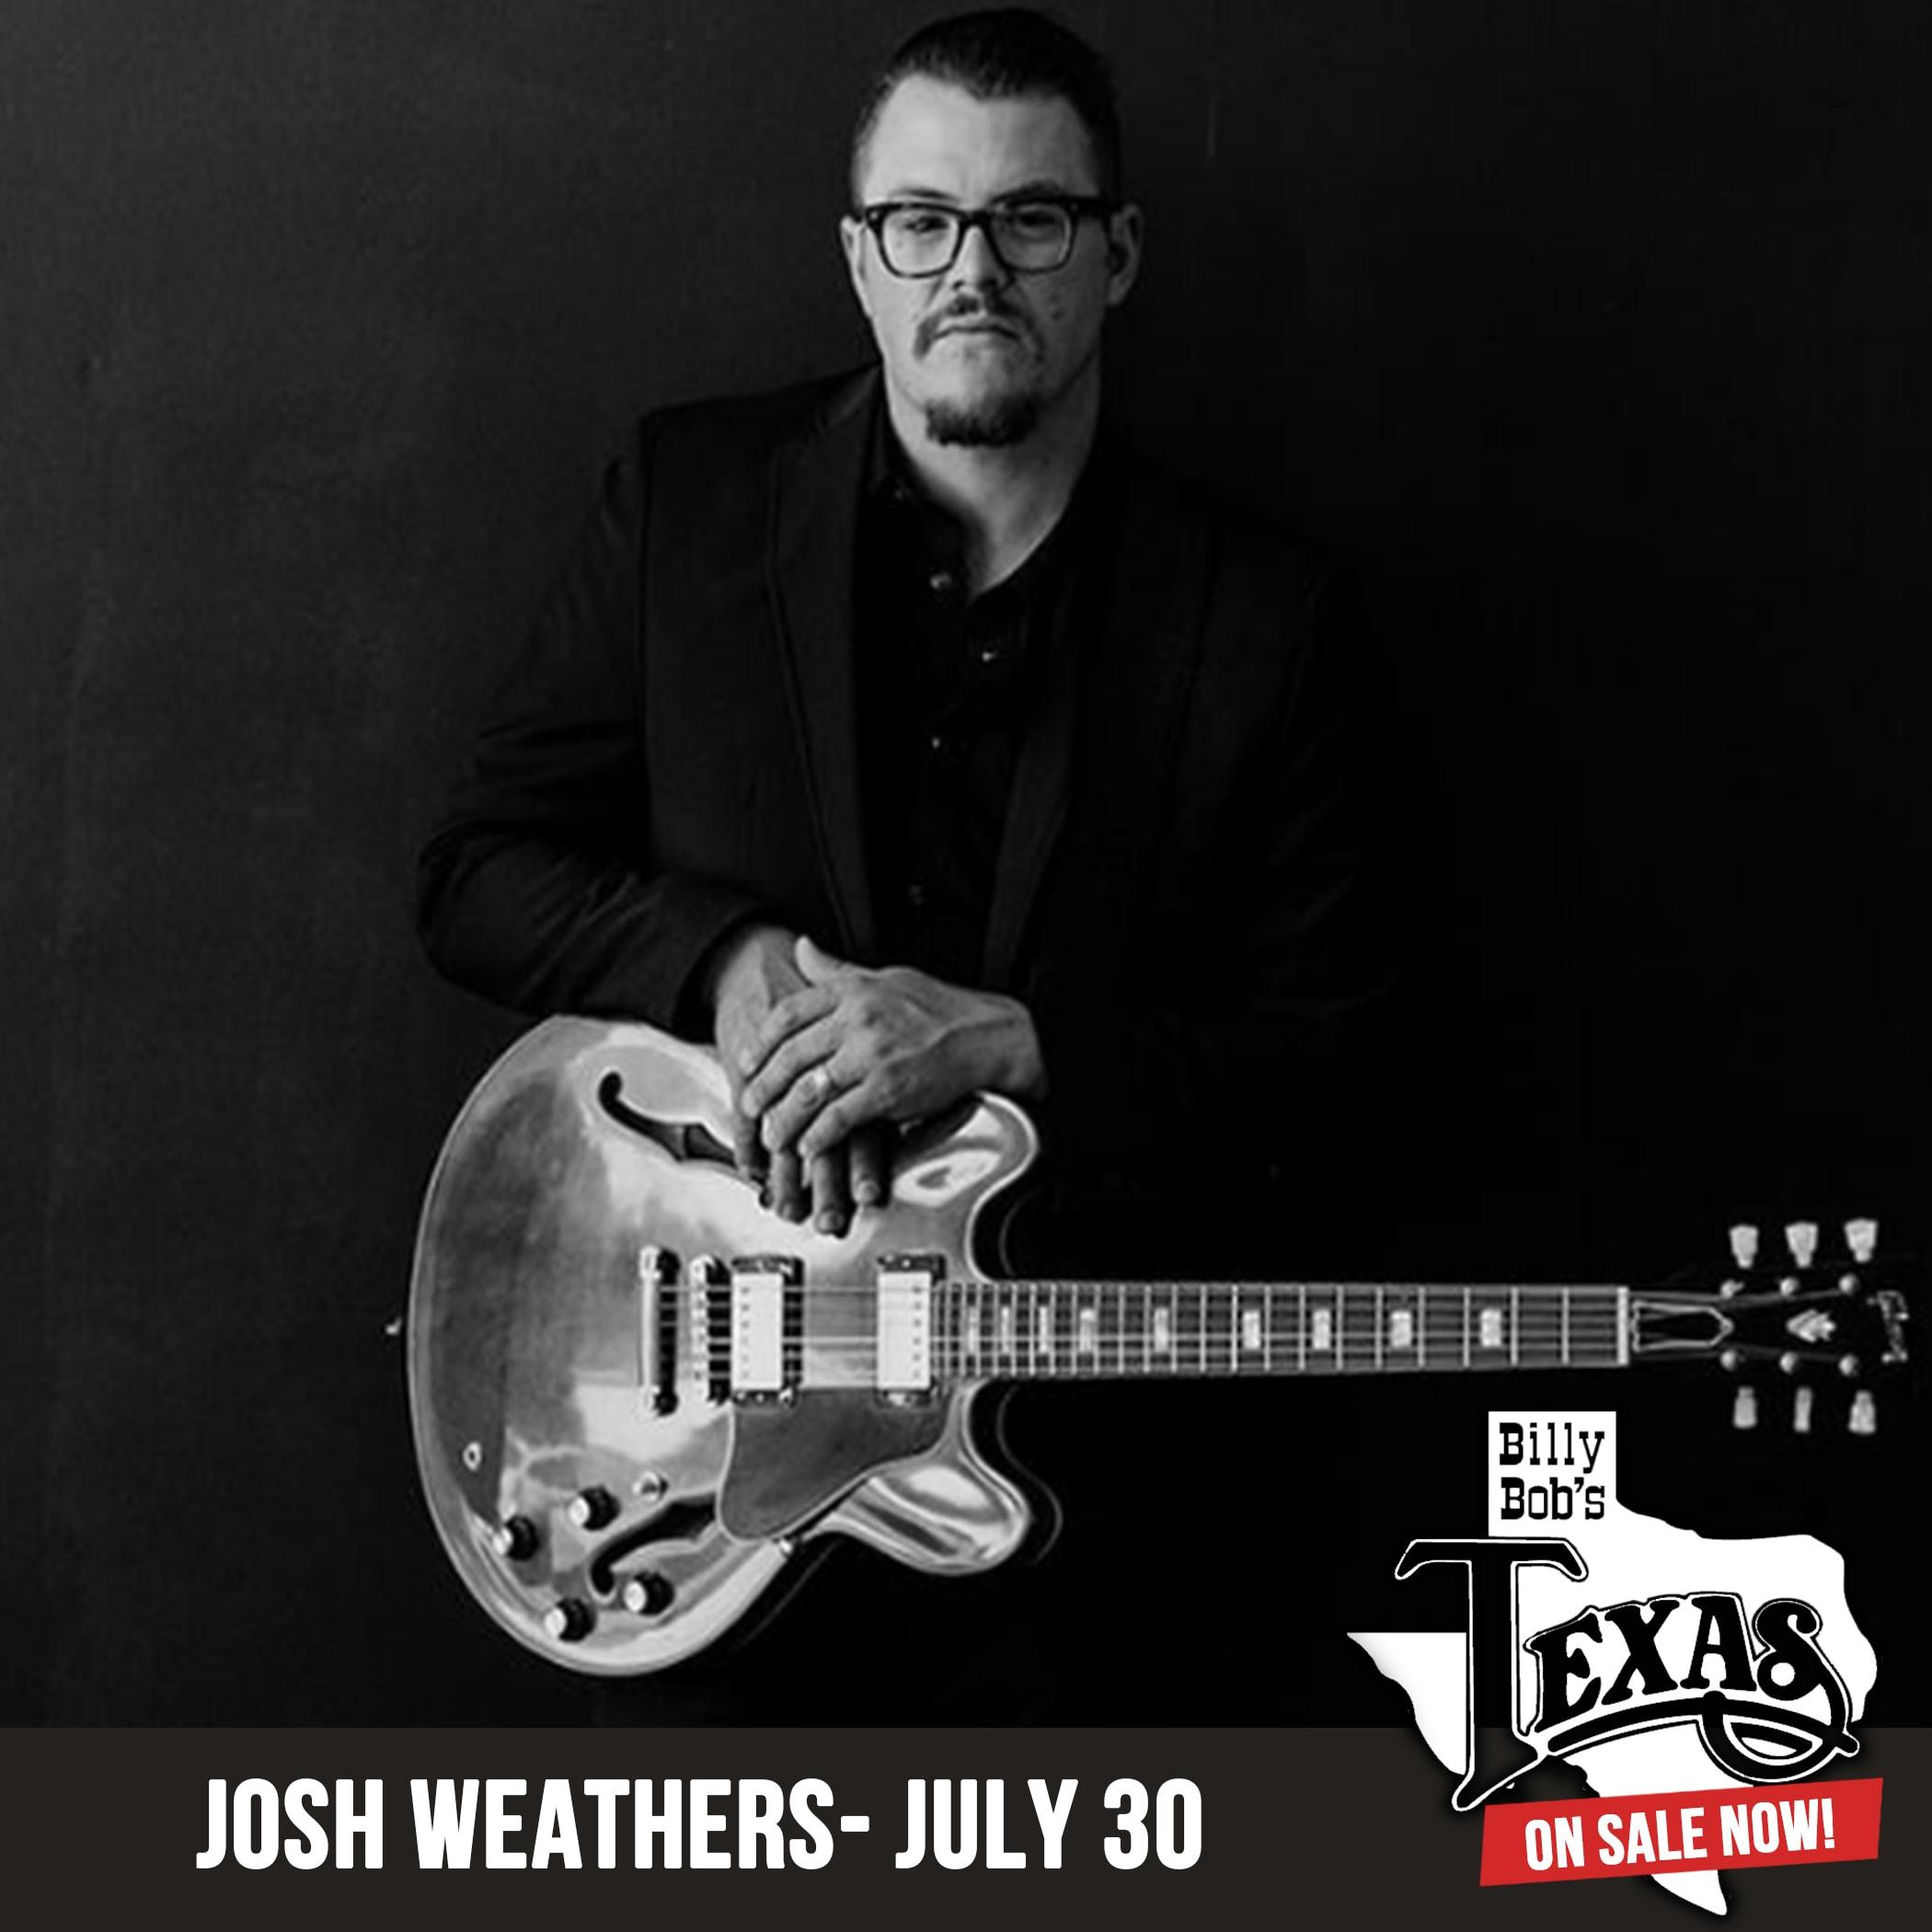 Josh Weathers poster